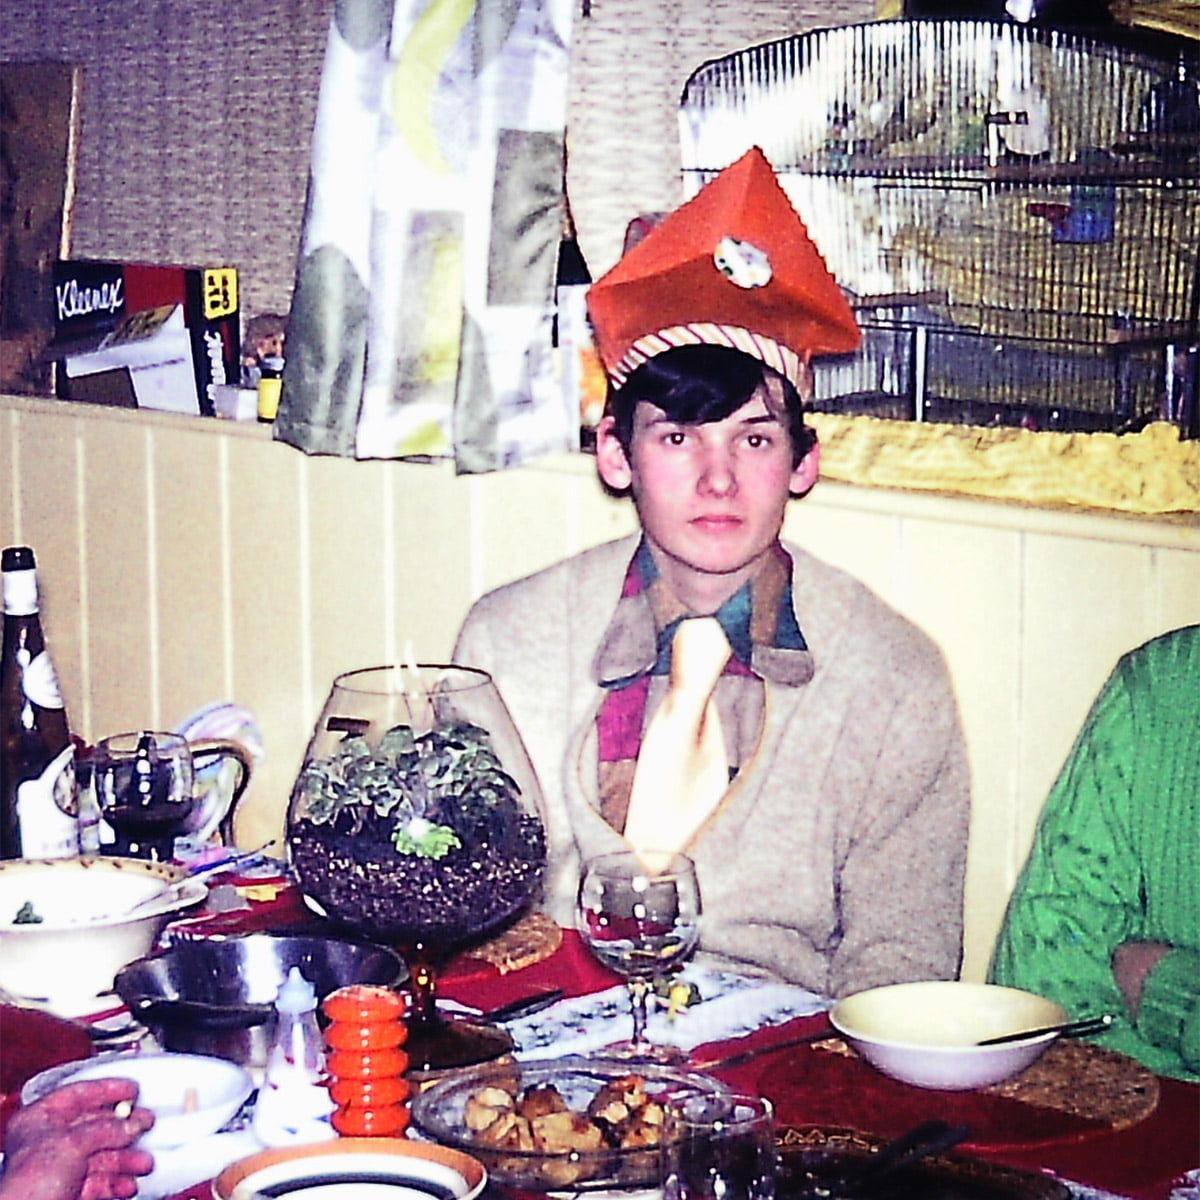 Geoff Stonebanks 1971 wearing Christmas hat